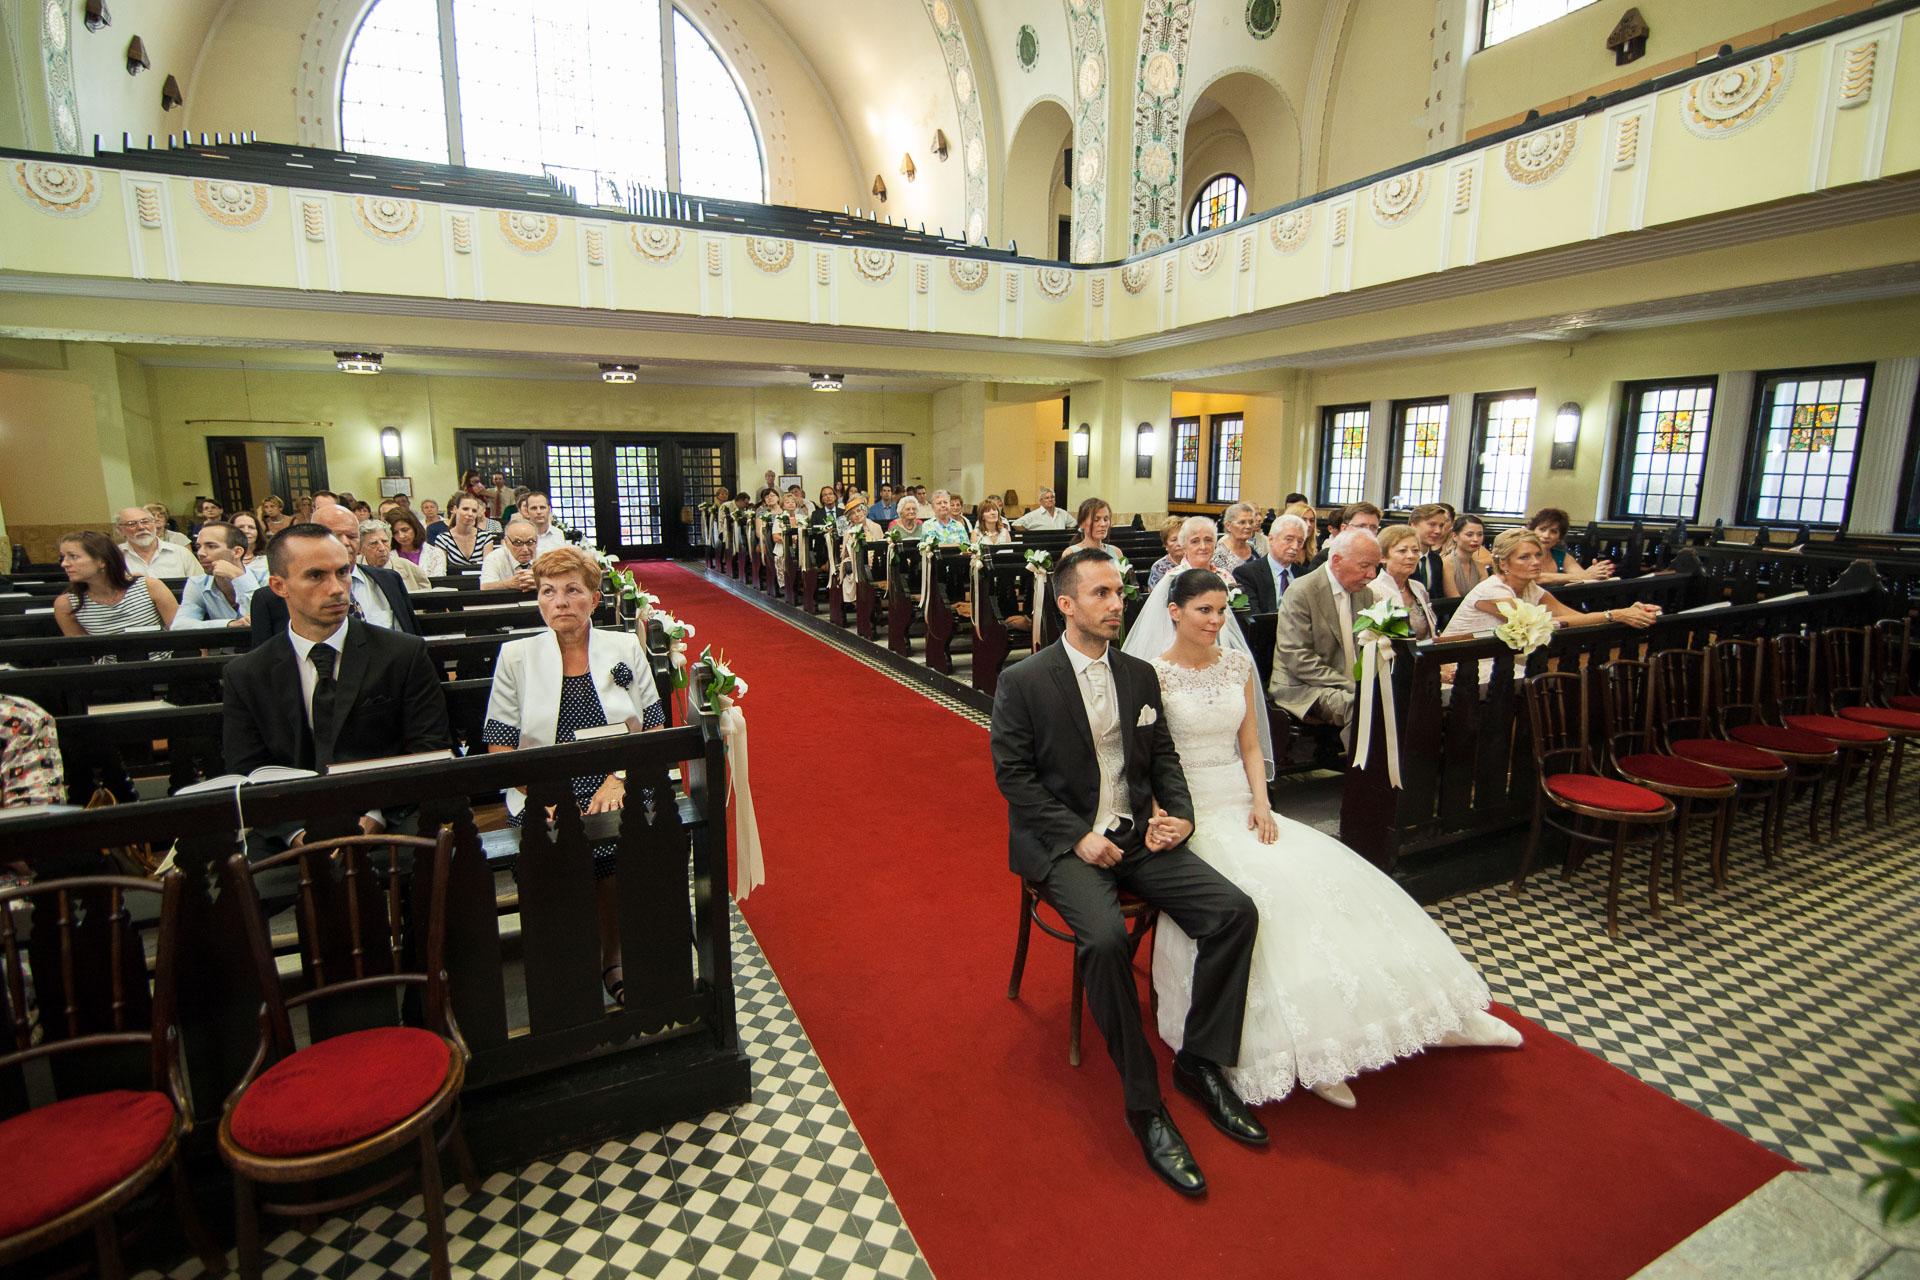 eskuvo_fotozas_wedding_foto_lenart_gabor_sztyui_budapest_IMG_6099